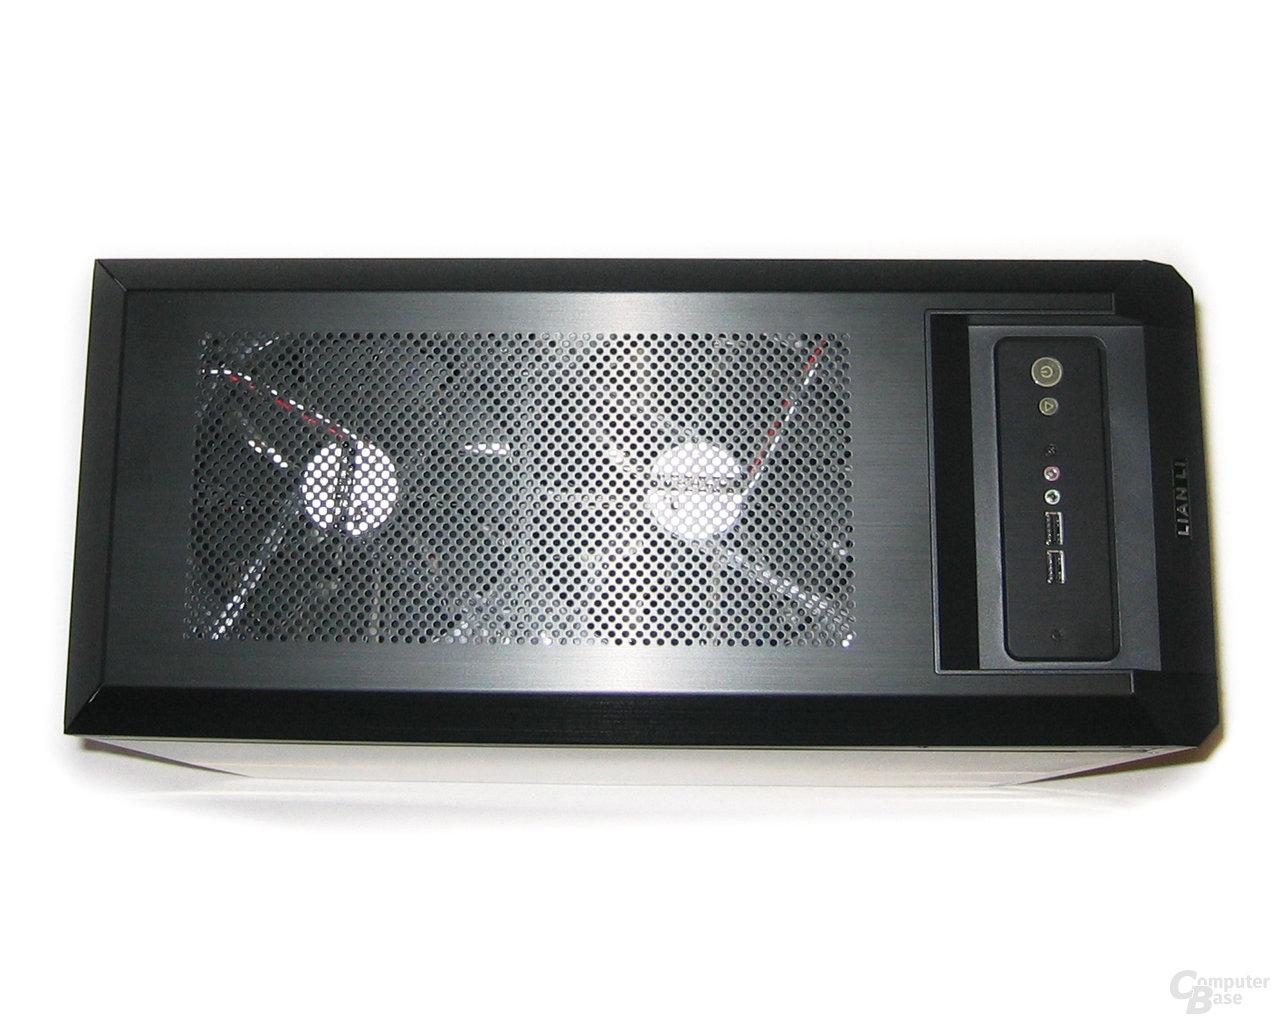 Lian Li Armorsuit PC-P50 – Deckel